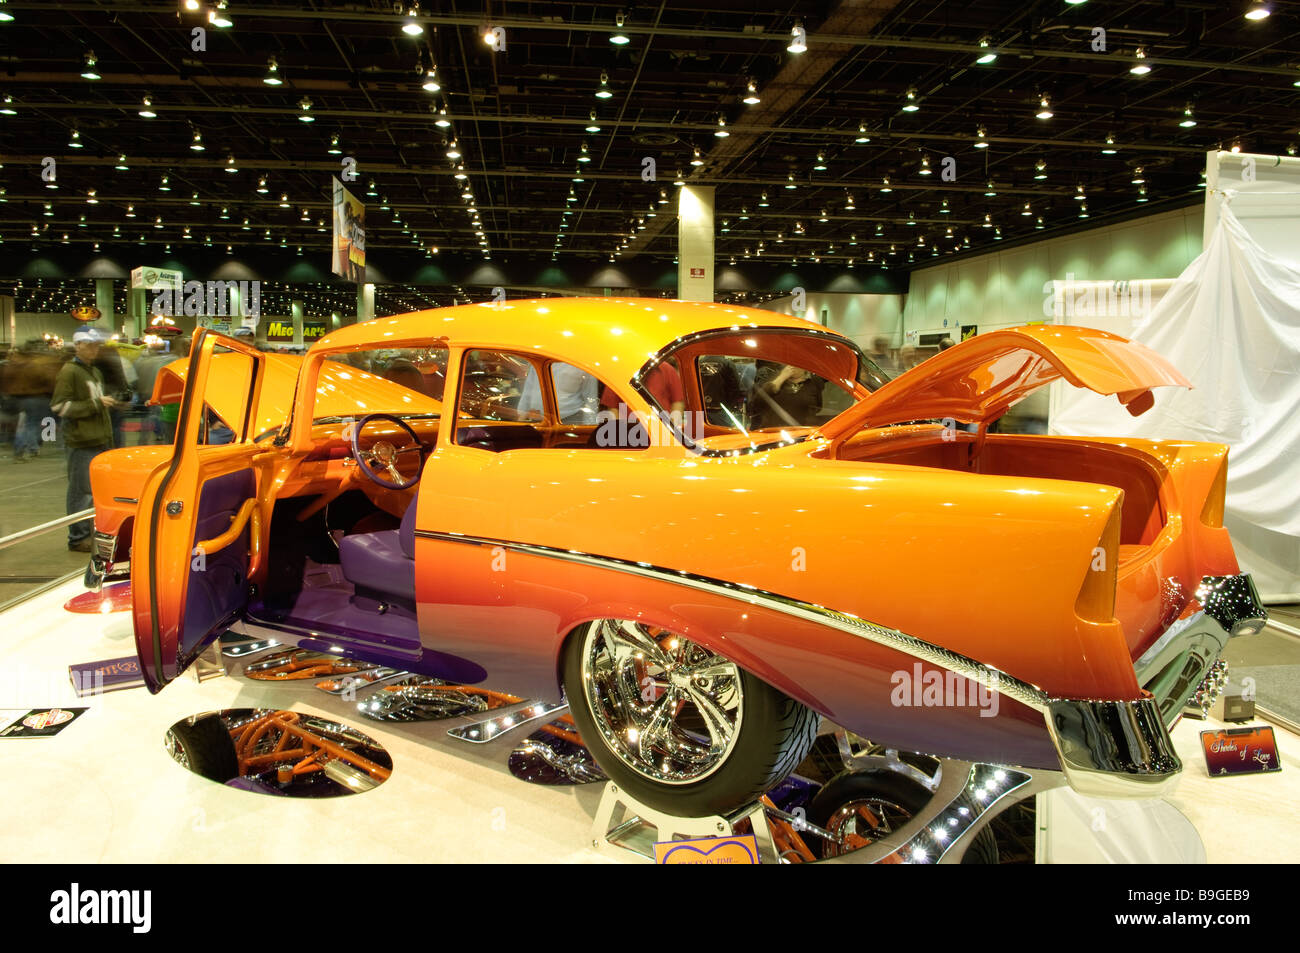 1956 Chevrolet 210 hard top hot rod at the 2009 Detroit Autorama - Stock Image